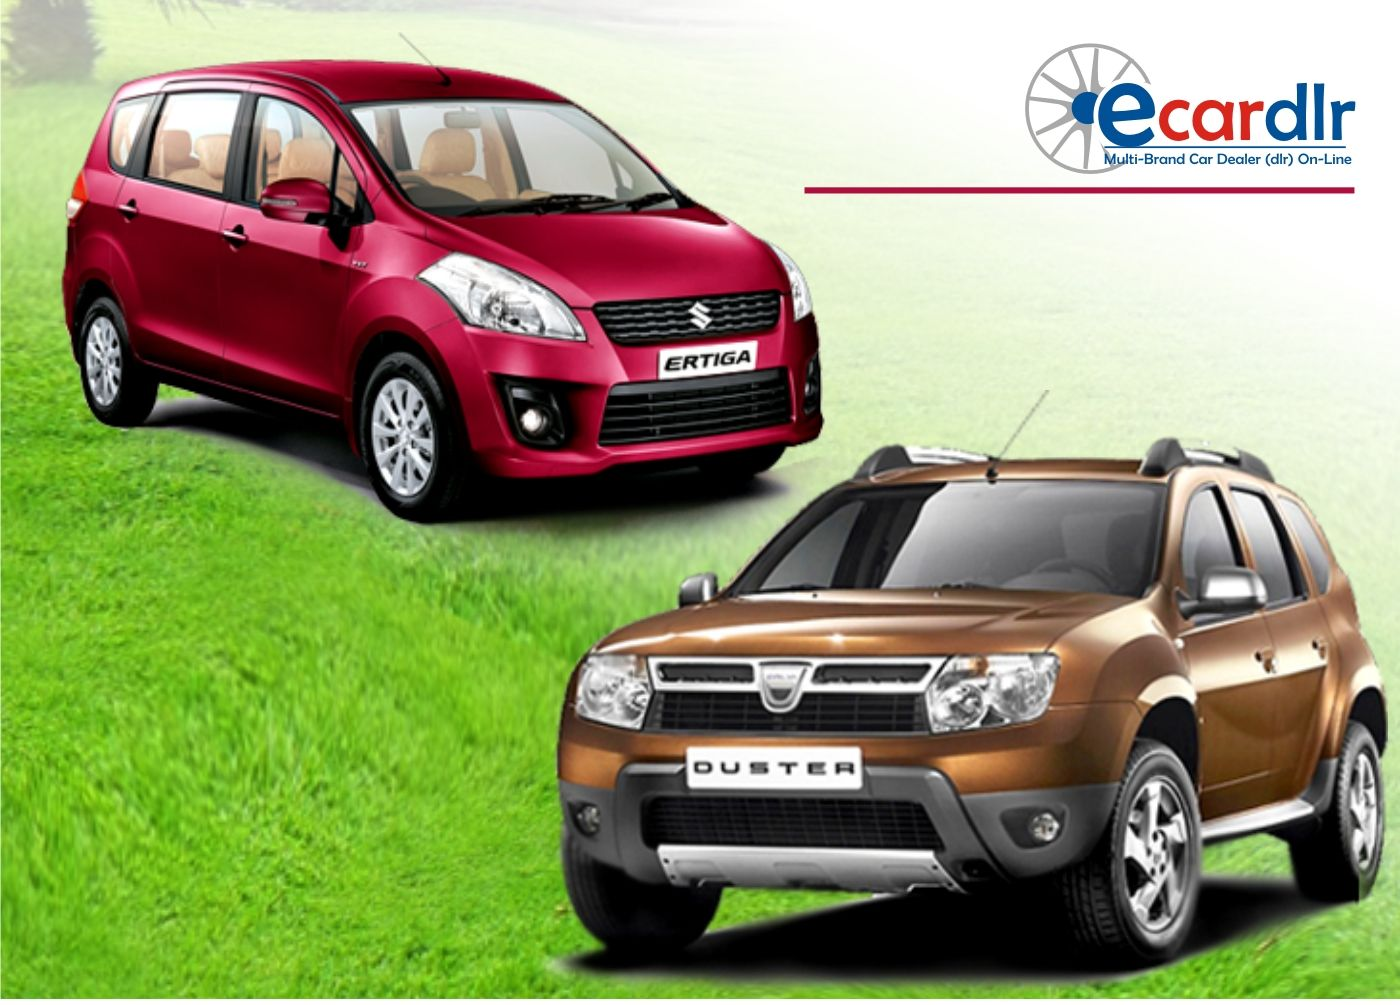 Comparison between Maruti Suzuki Ertiga vs Renault Duster